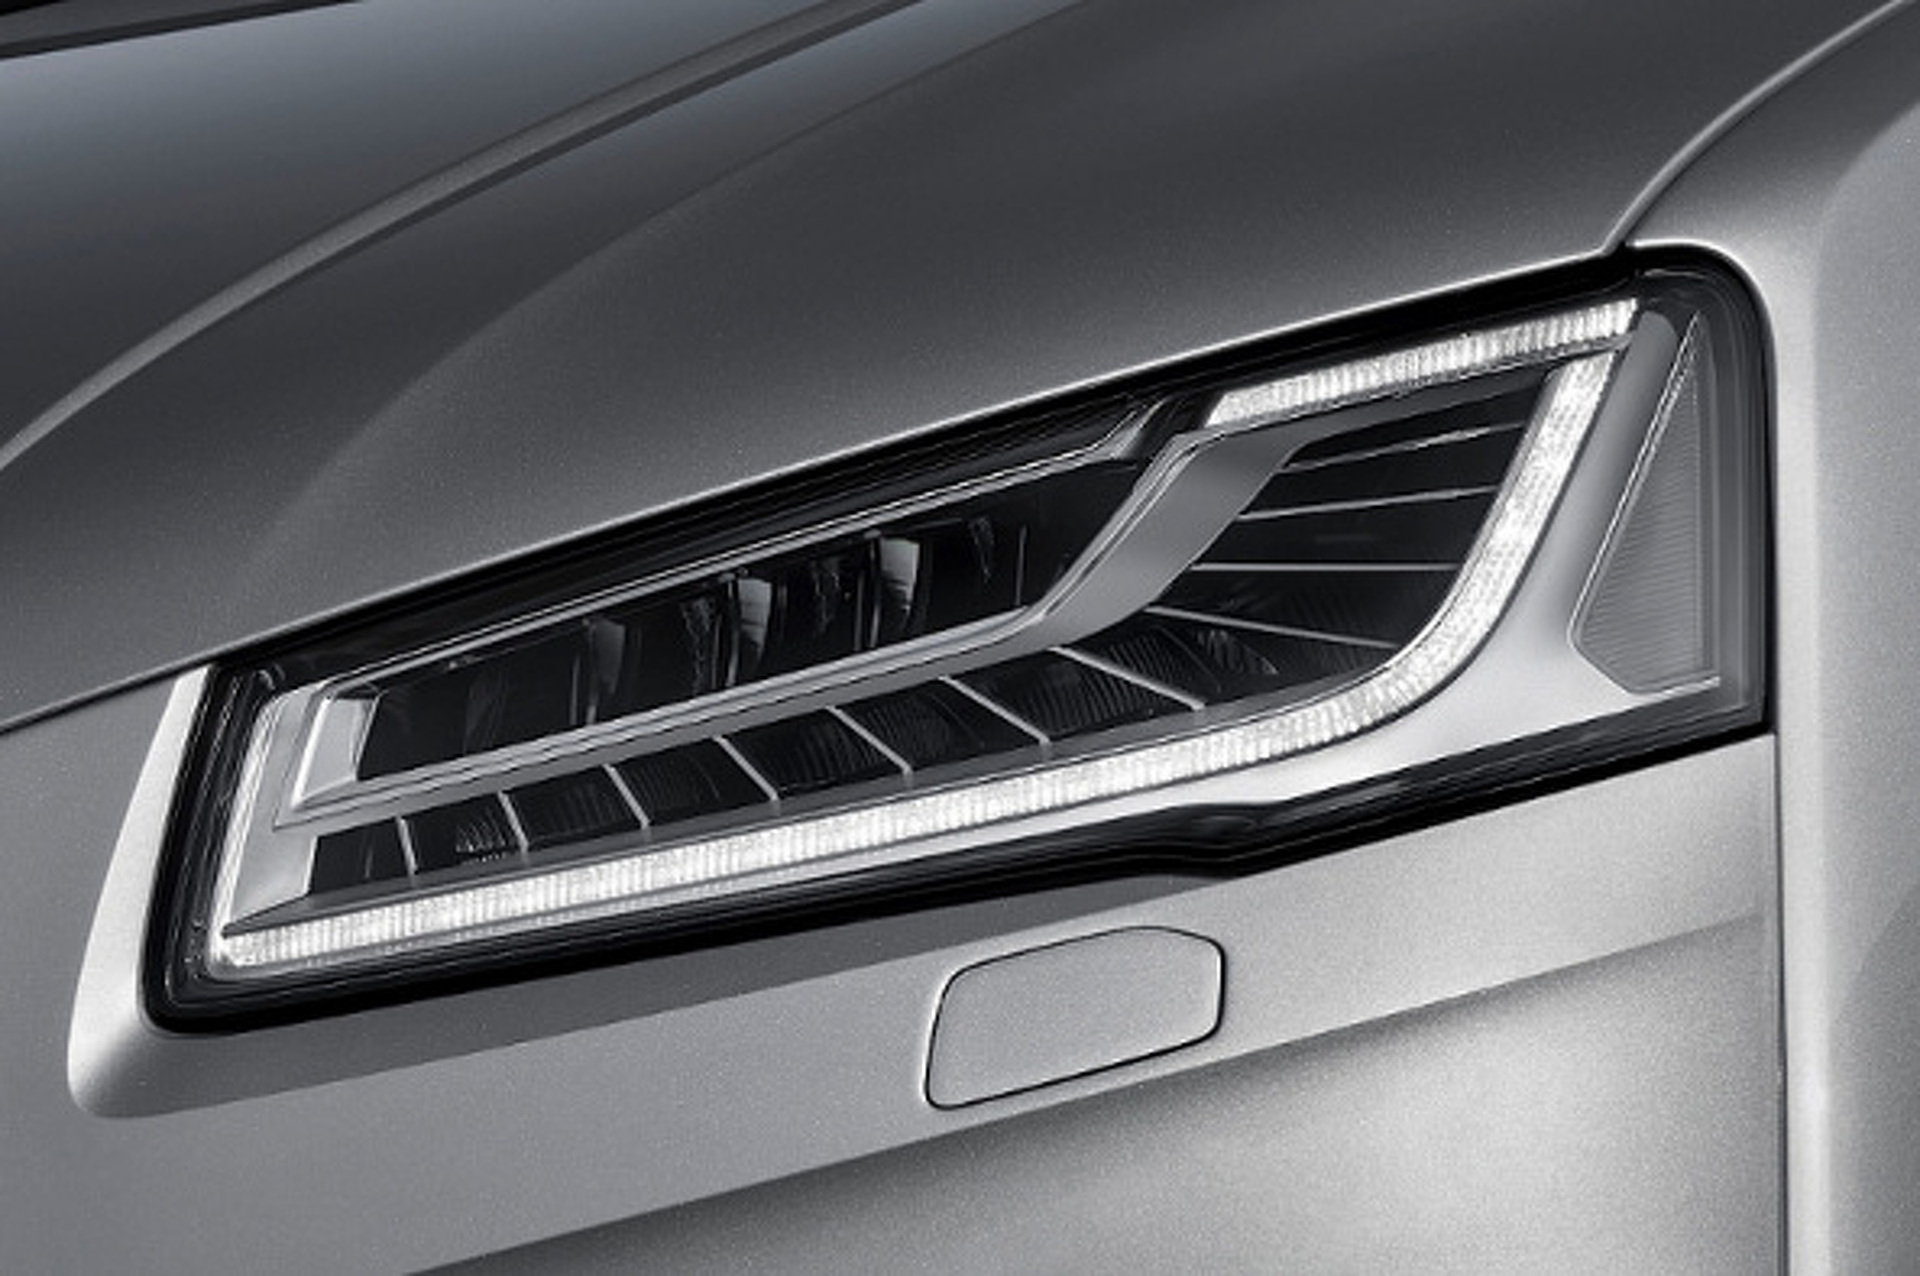 Audi (Still) Battling NHTSA Over New Lighting Tech